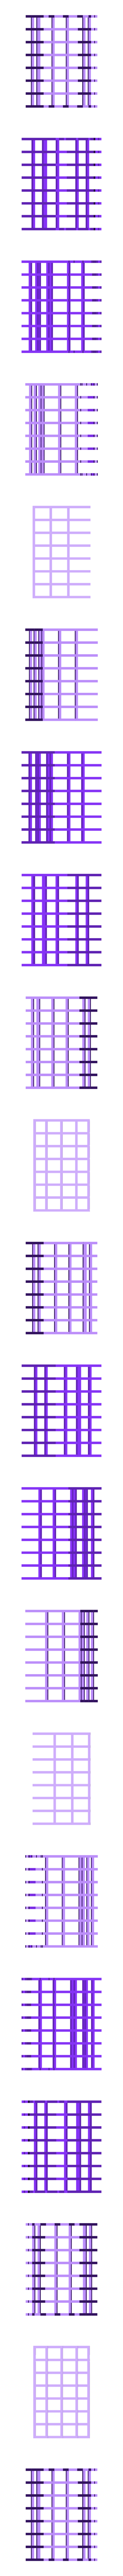 ps-cage-006.stl Download free STL file Electronics Cage • 3D printing design, pumpkinhead3d